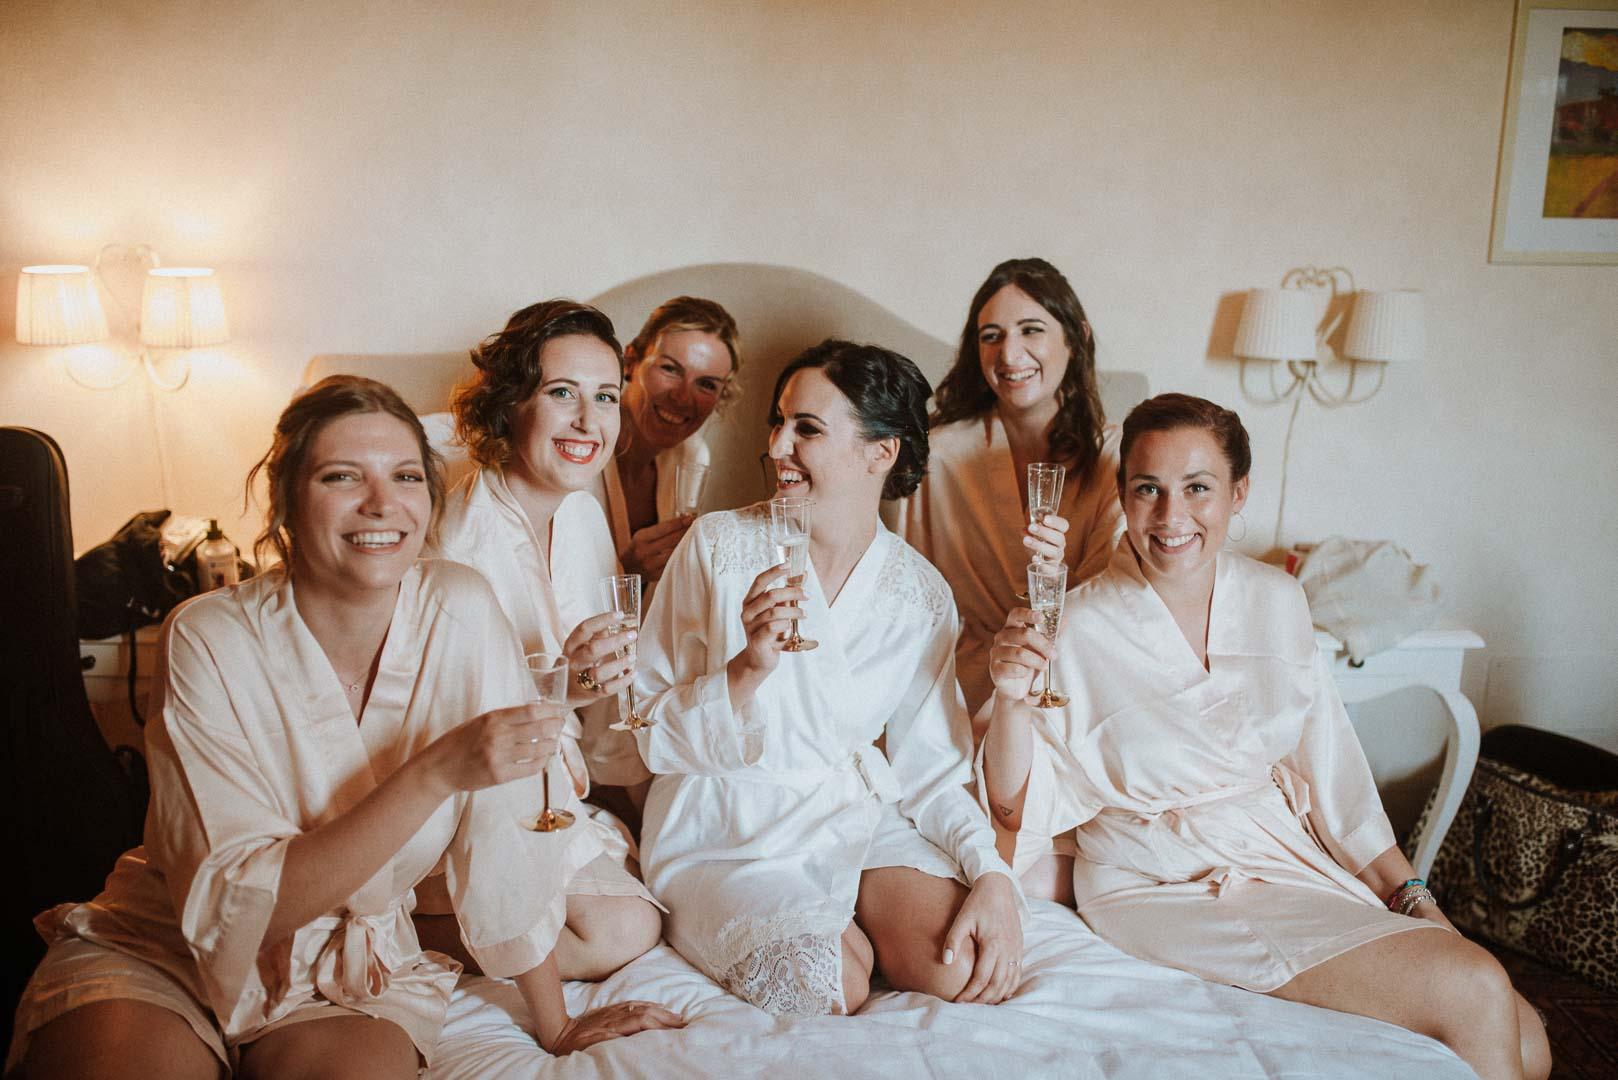 wedding-photographer-destination-fineart-bespoke-reportage-tuscany-villascorzi-vivianeizzo-spazio46-46